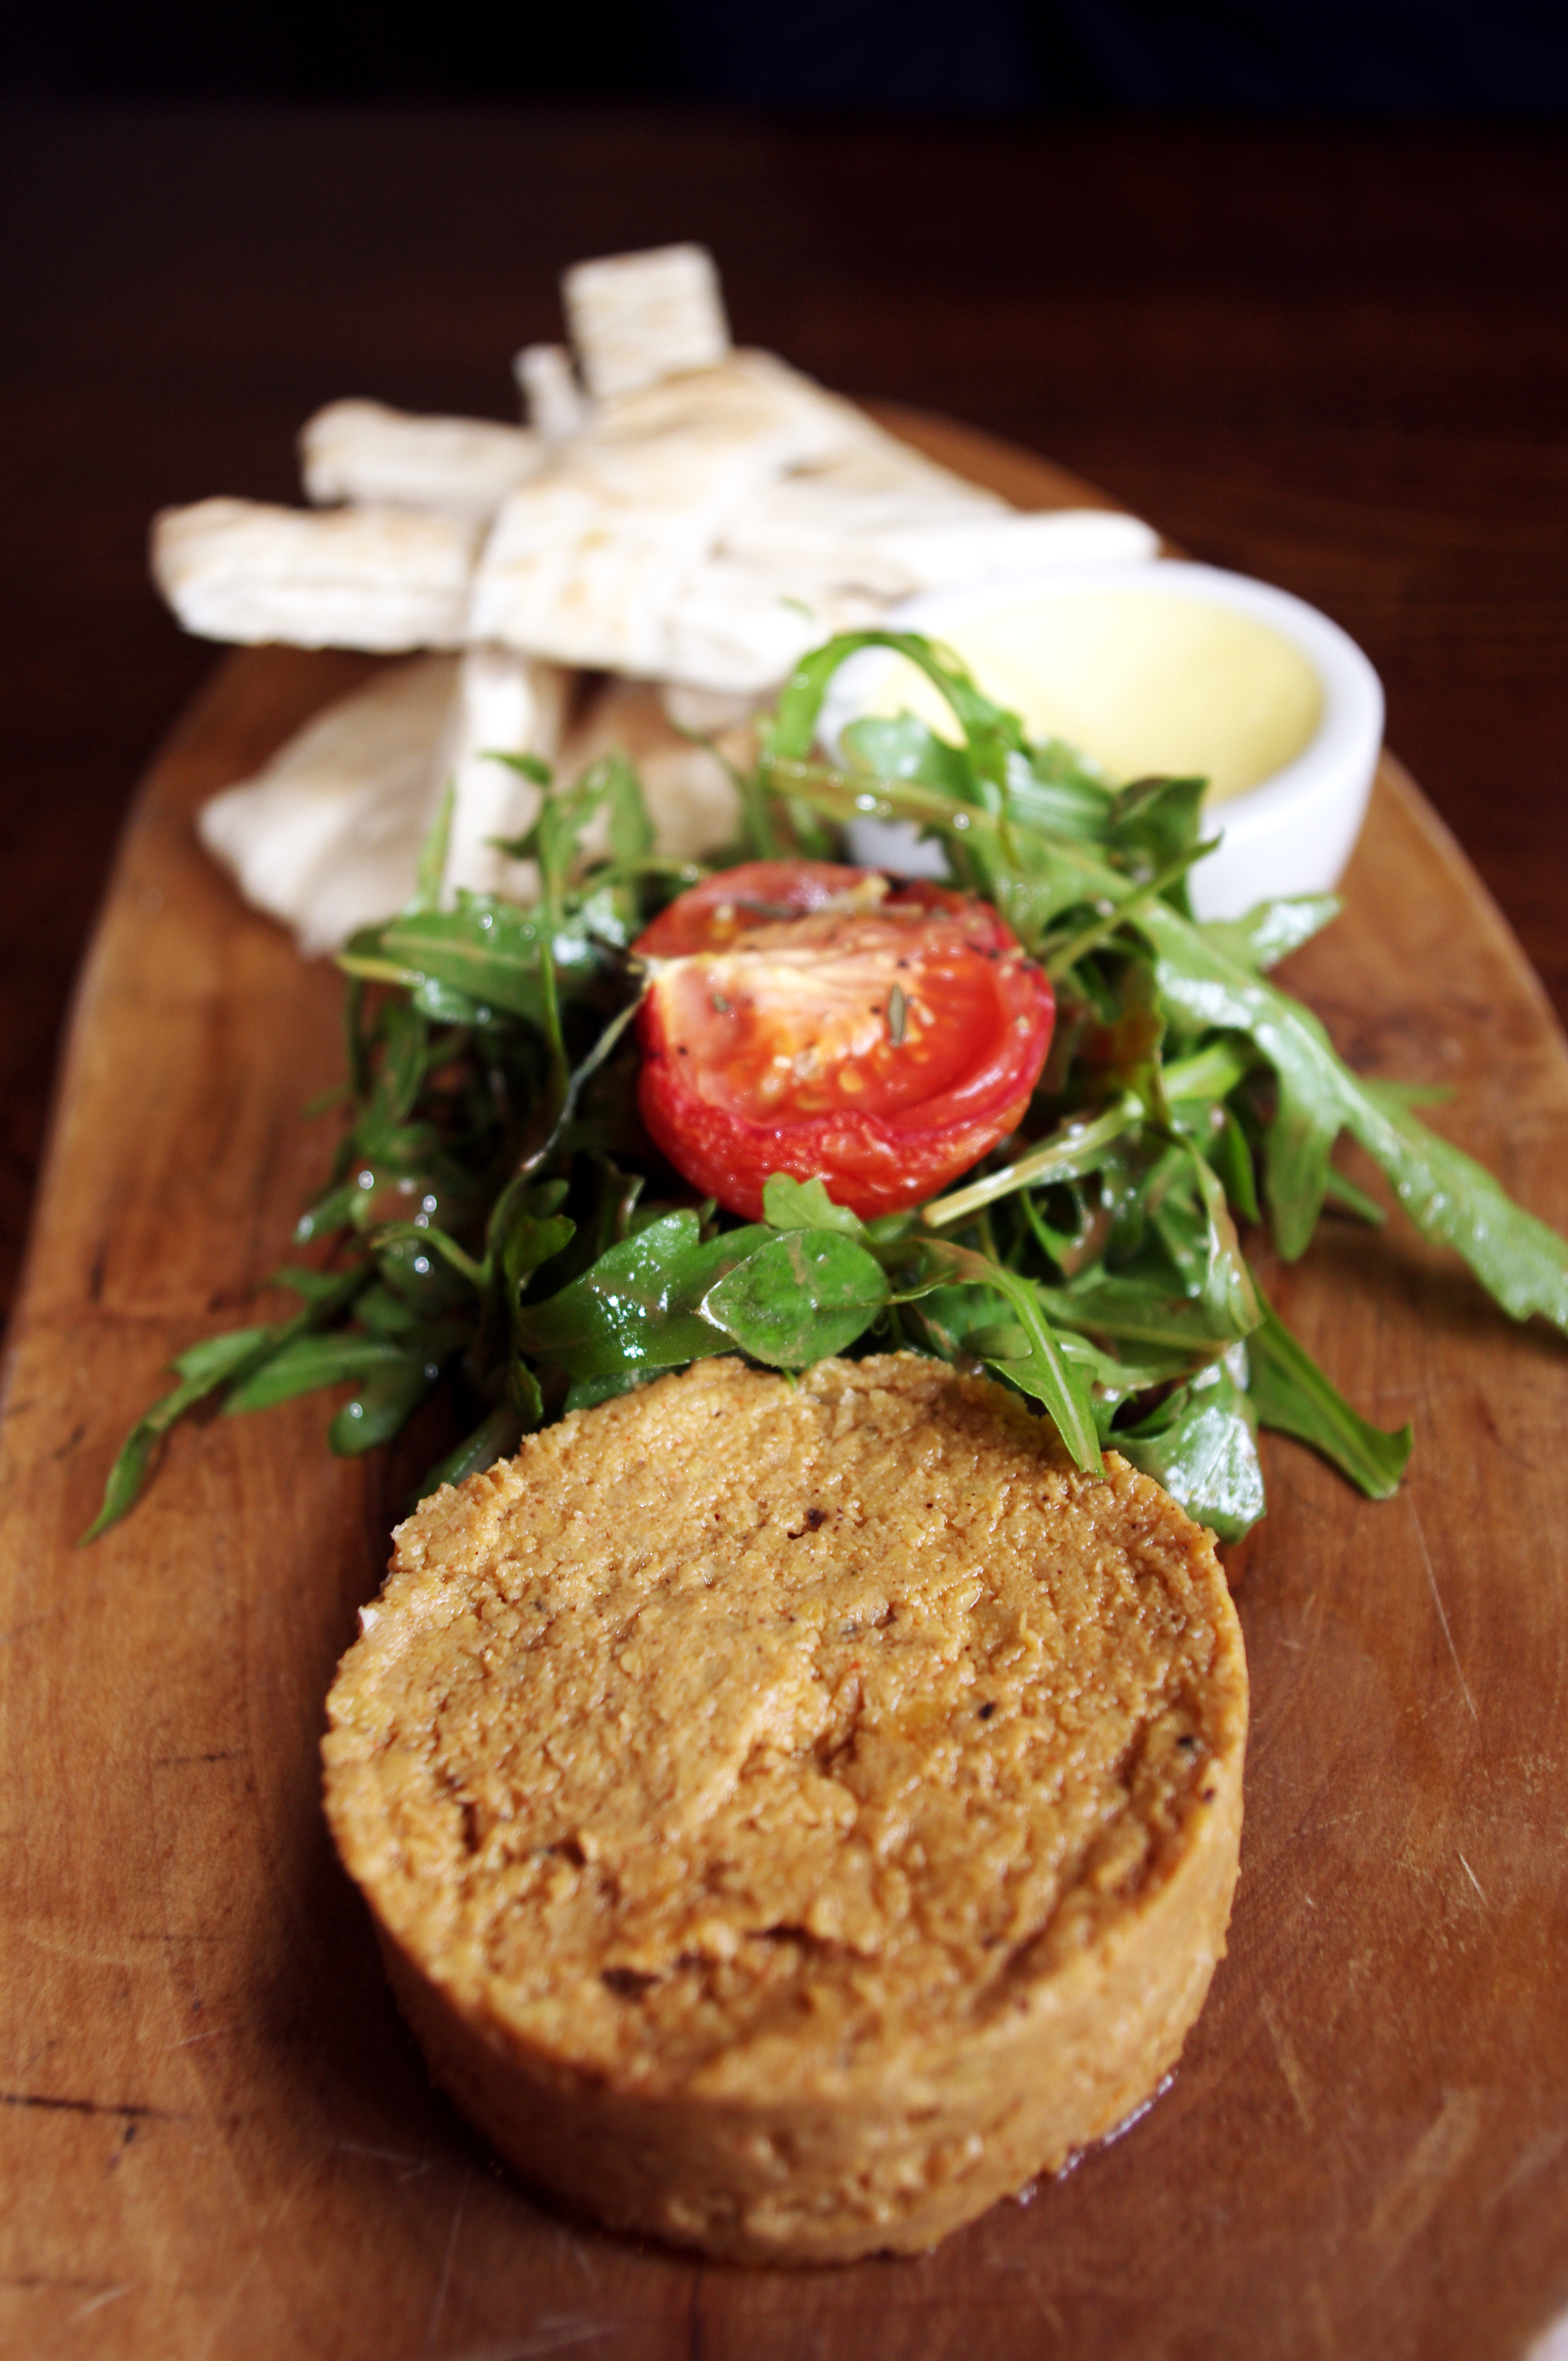 Rustic Hummus & Pitta Bread